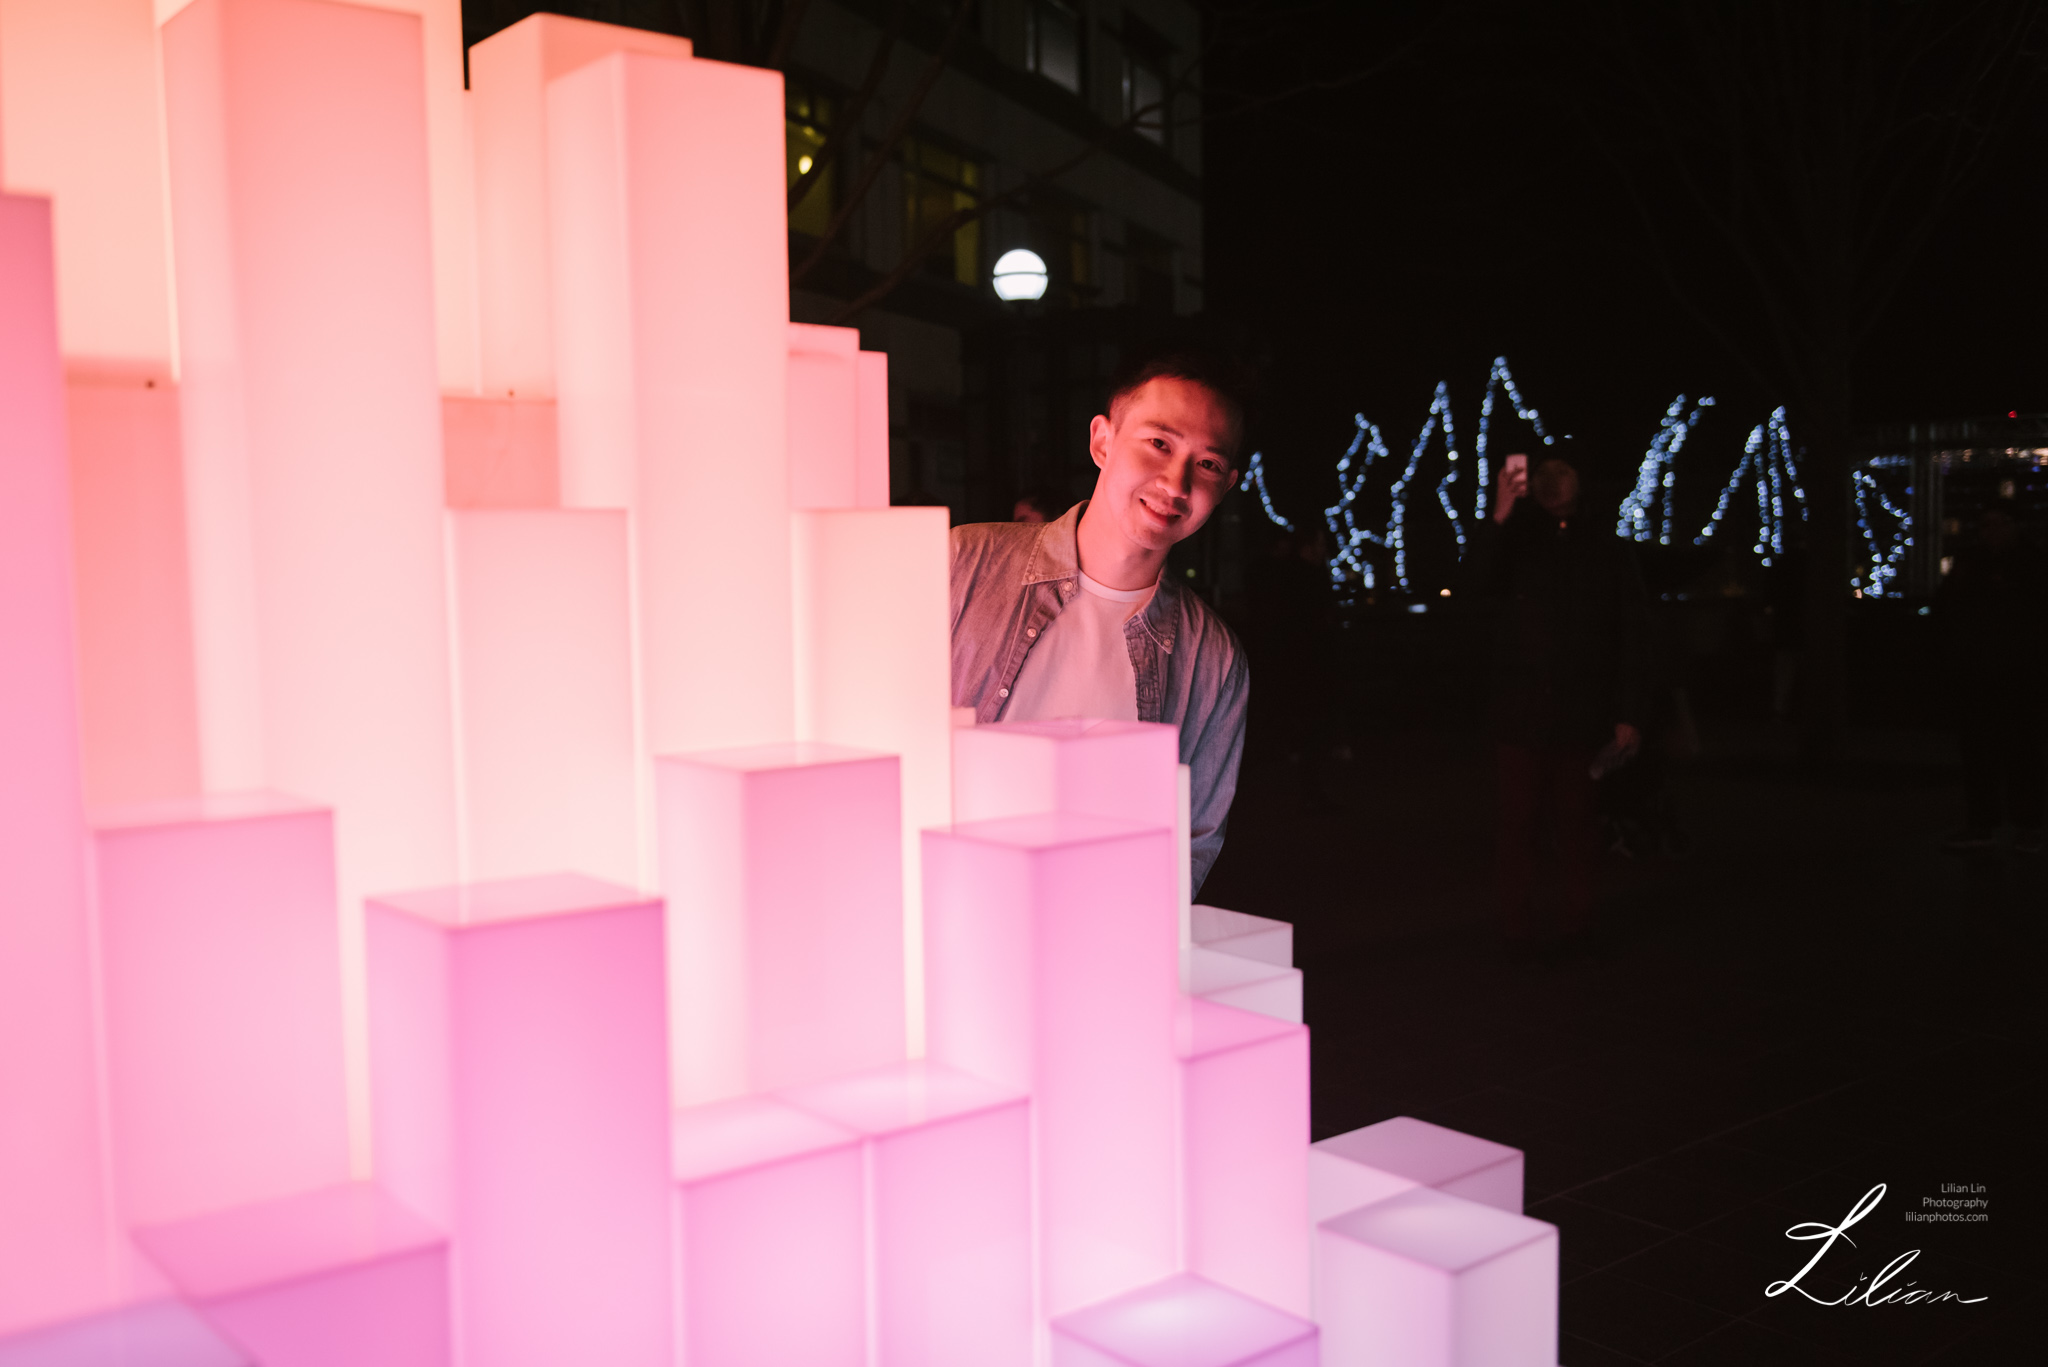 Lilian Lin Photography prewedding London Winter Lights London Photographer 倫敦婚紗 婚紗攝影師 女攝影師